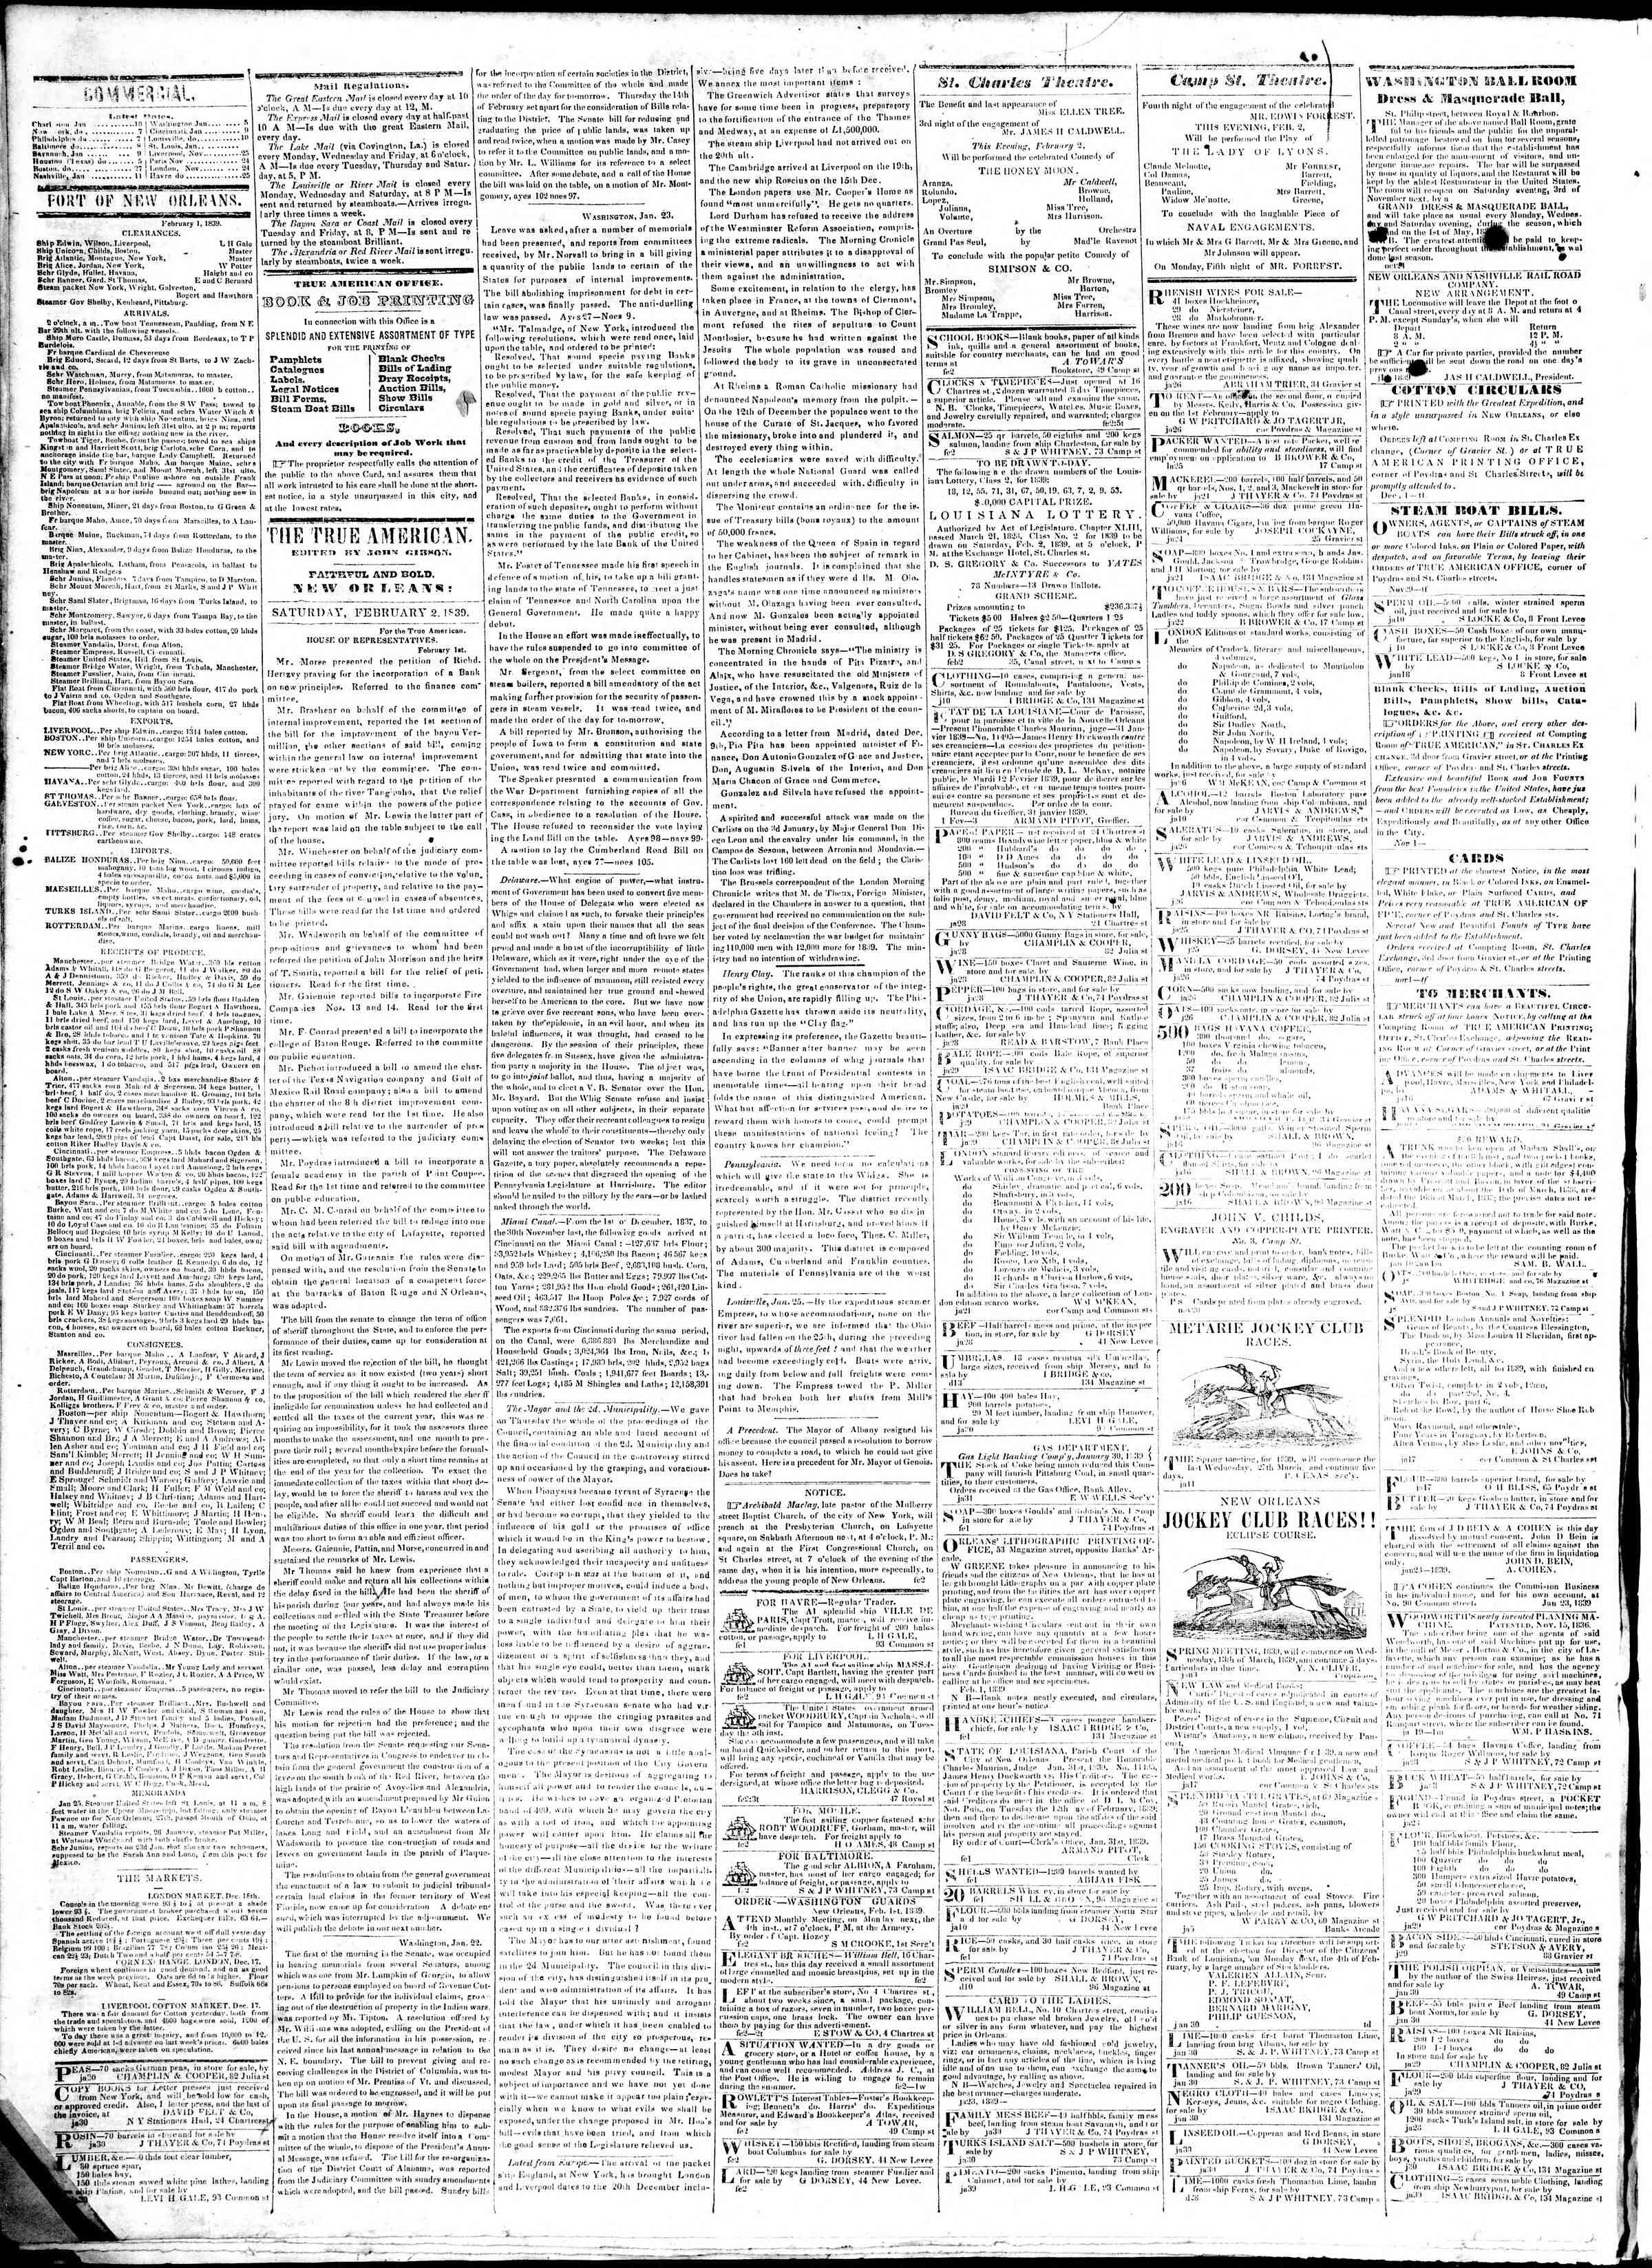 February 2, 1839 Tarihli True American Gazetesi Sayfa 2